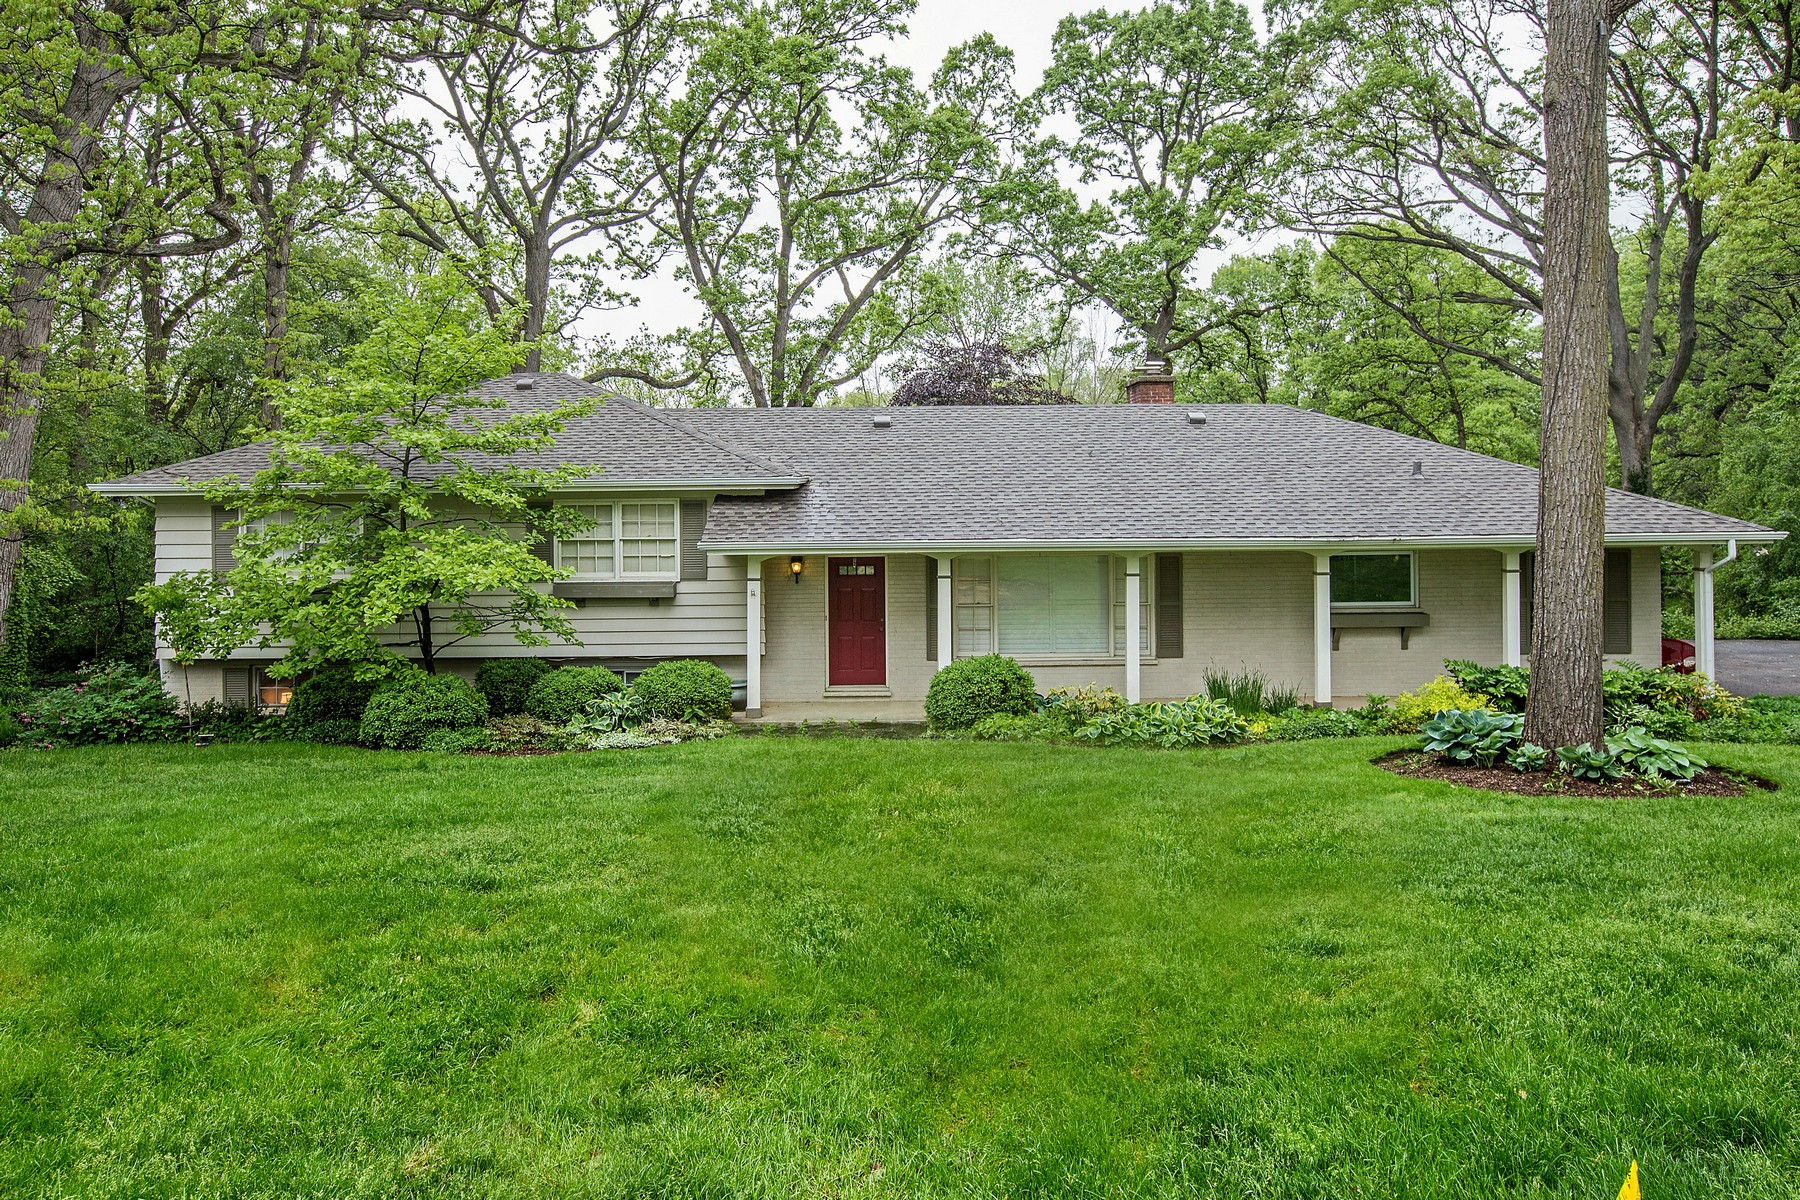 Moradia para Venda às Beautiful Wooded 2.74 Acre Homesite 1152 Blackburn Drive Inverness, Illinois, 60067 Estados Unidos